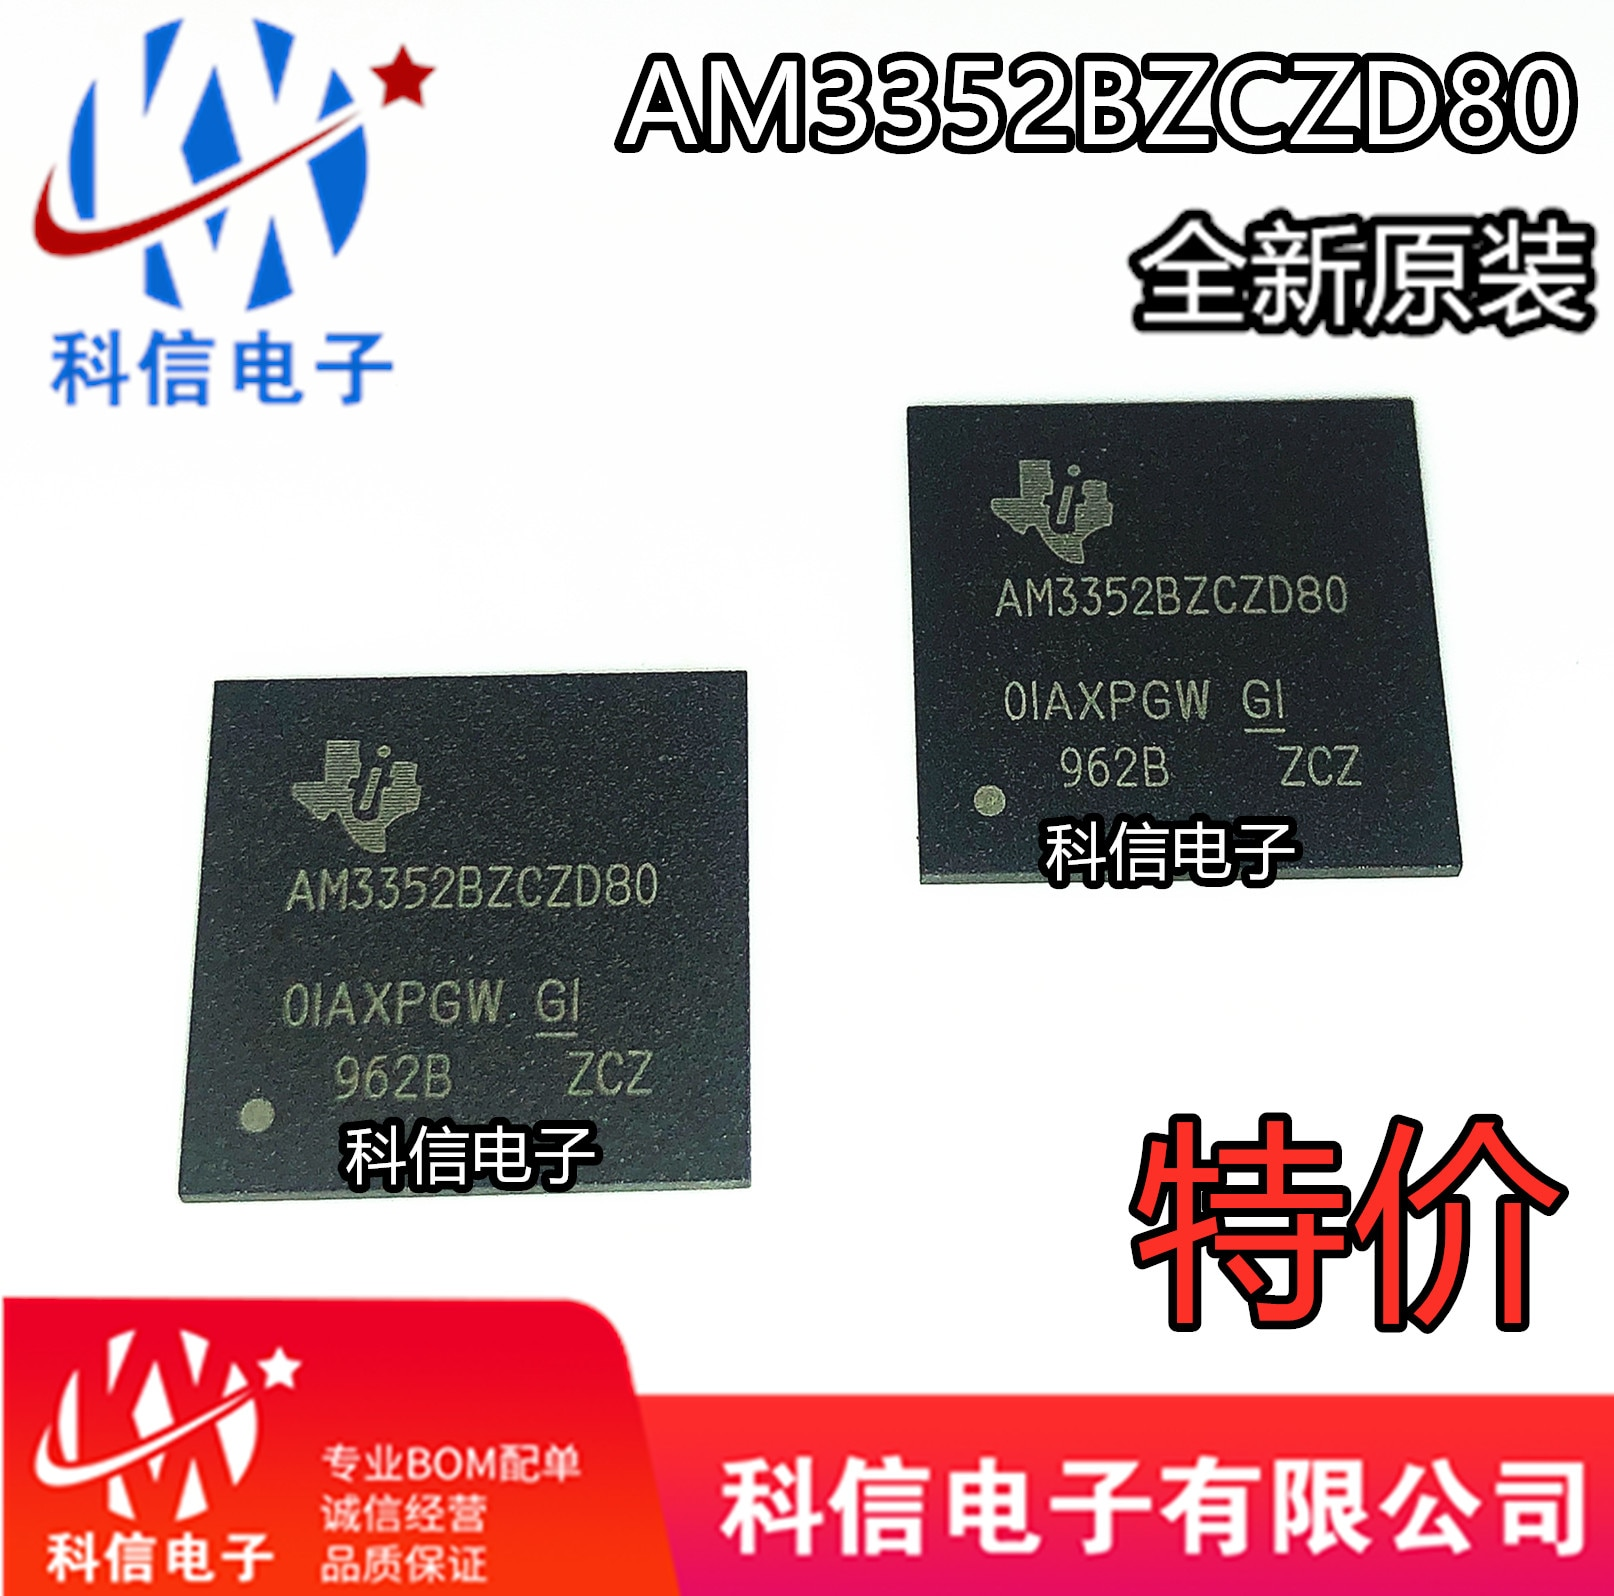 Original novo am3352bzczd60 am3352bzczd BGA 324 integrado ic chip Cabos de computador e conectores    -